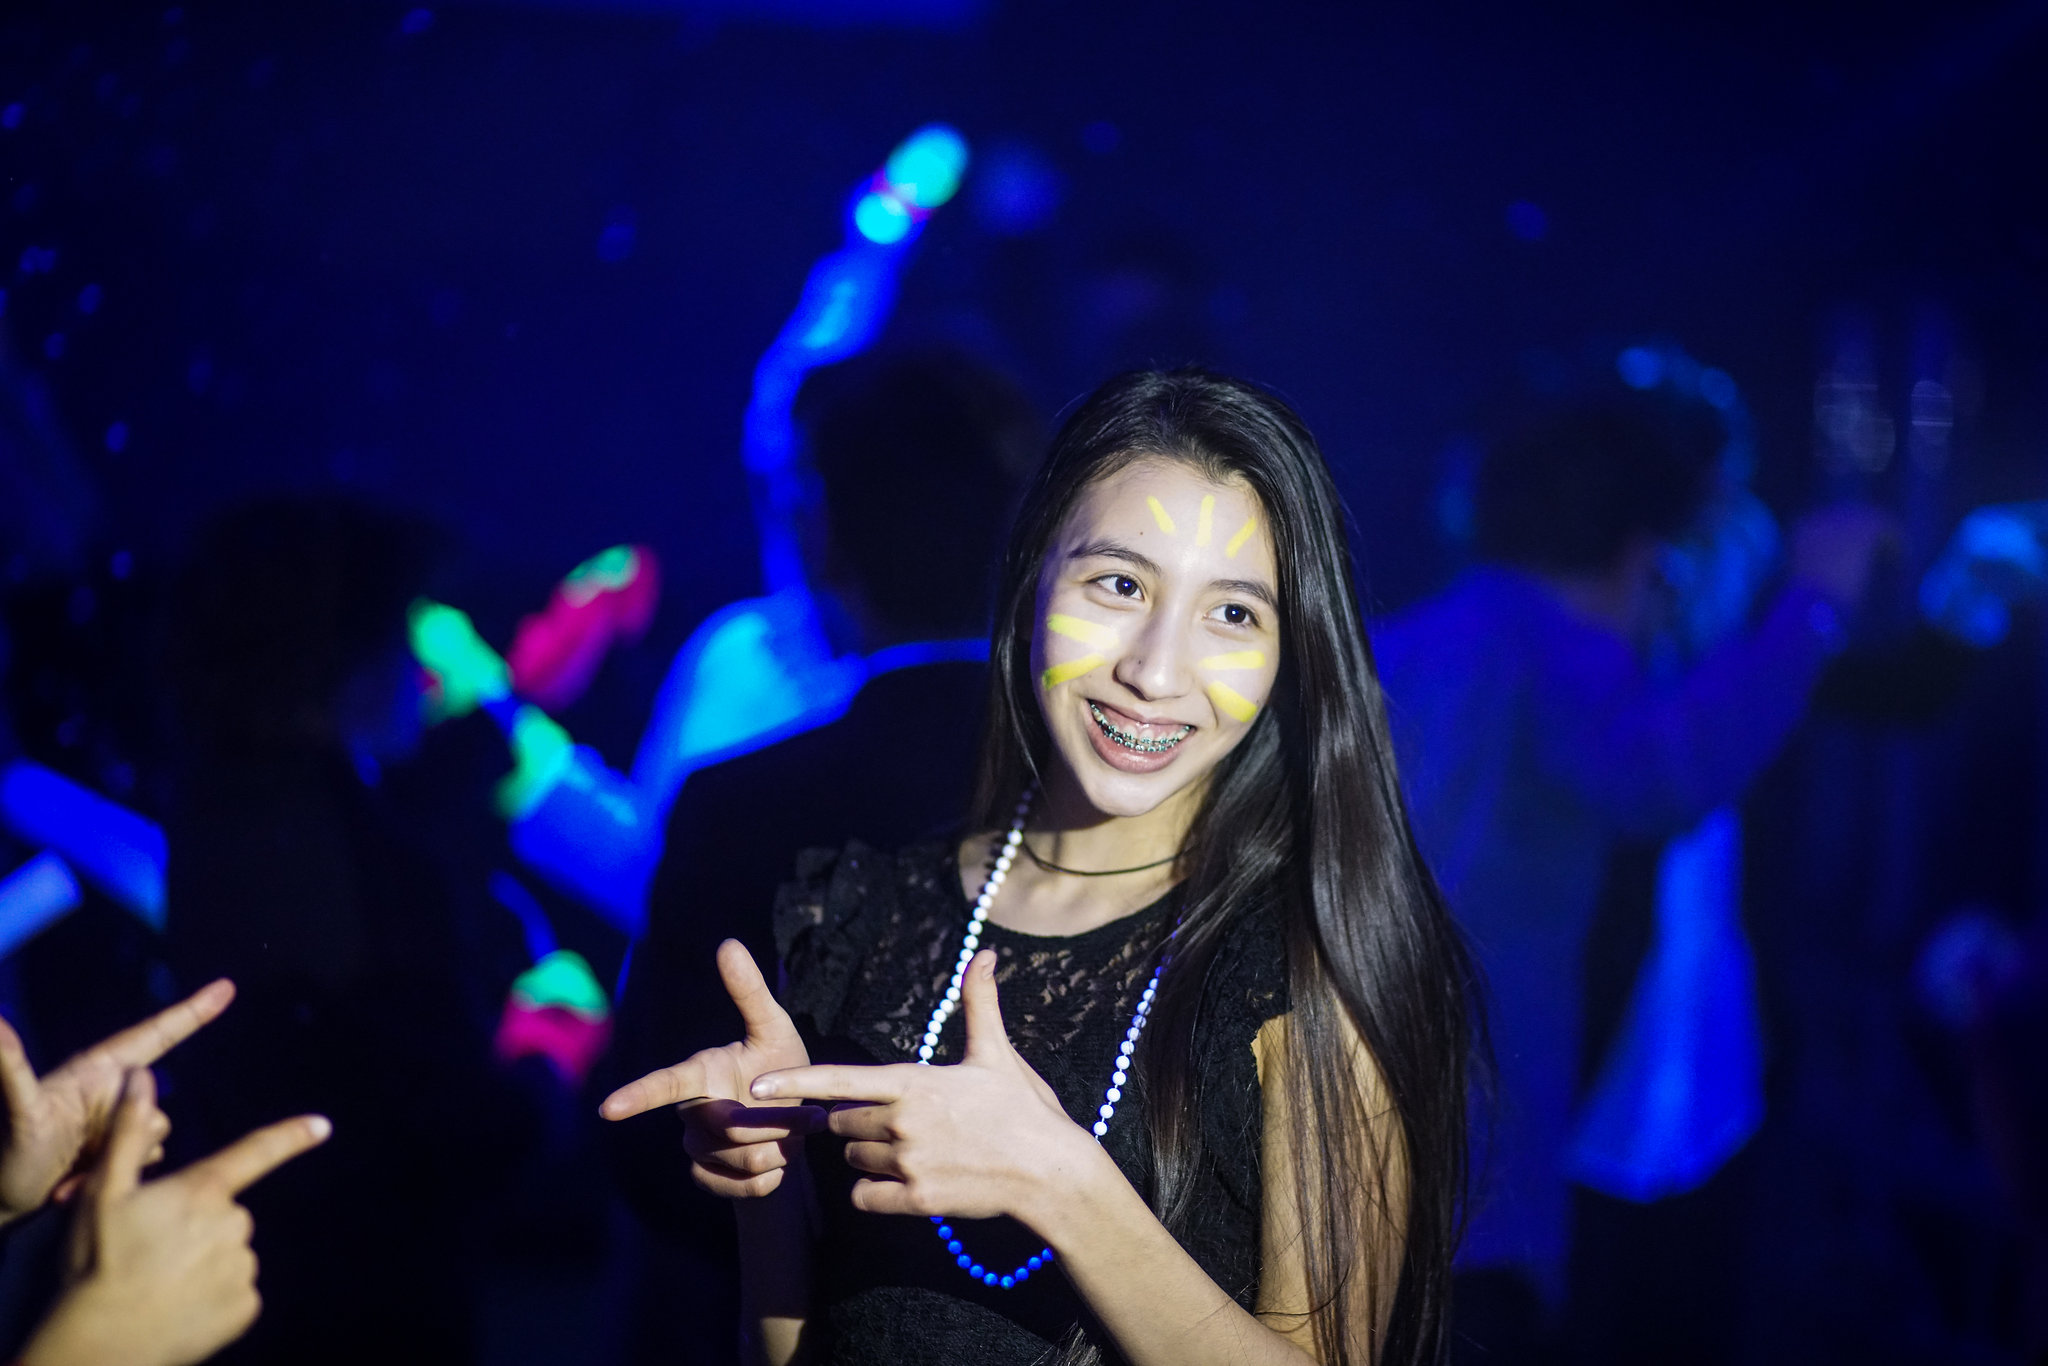 04_20171209_AlexBM_Party-484.jpg